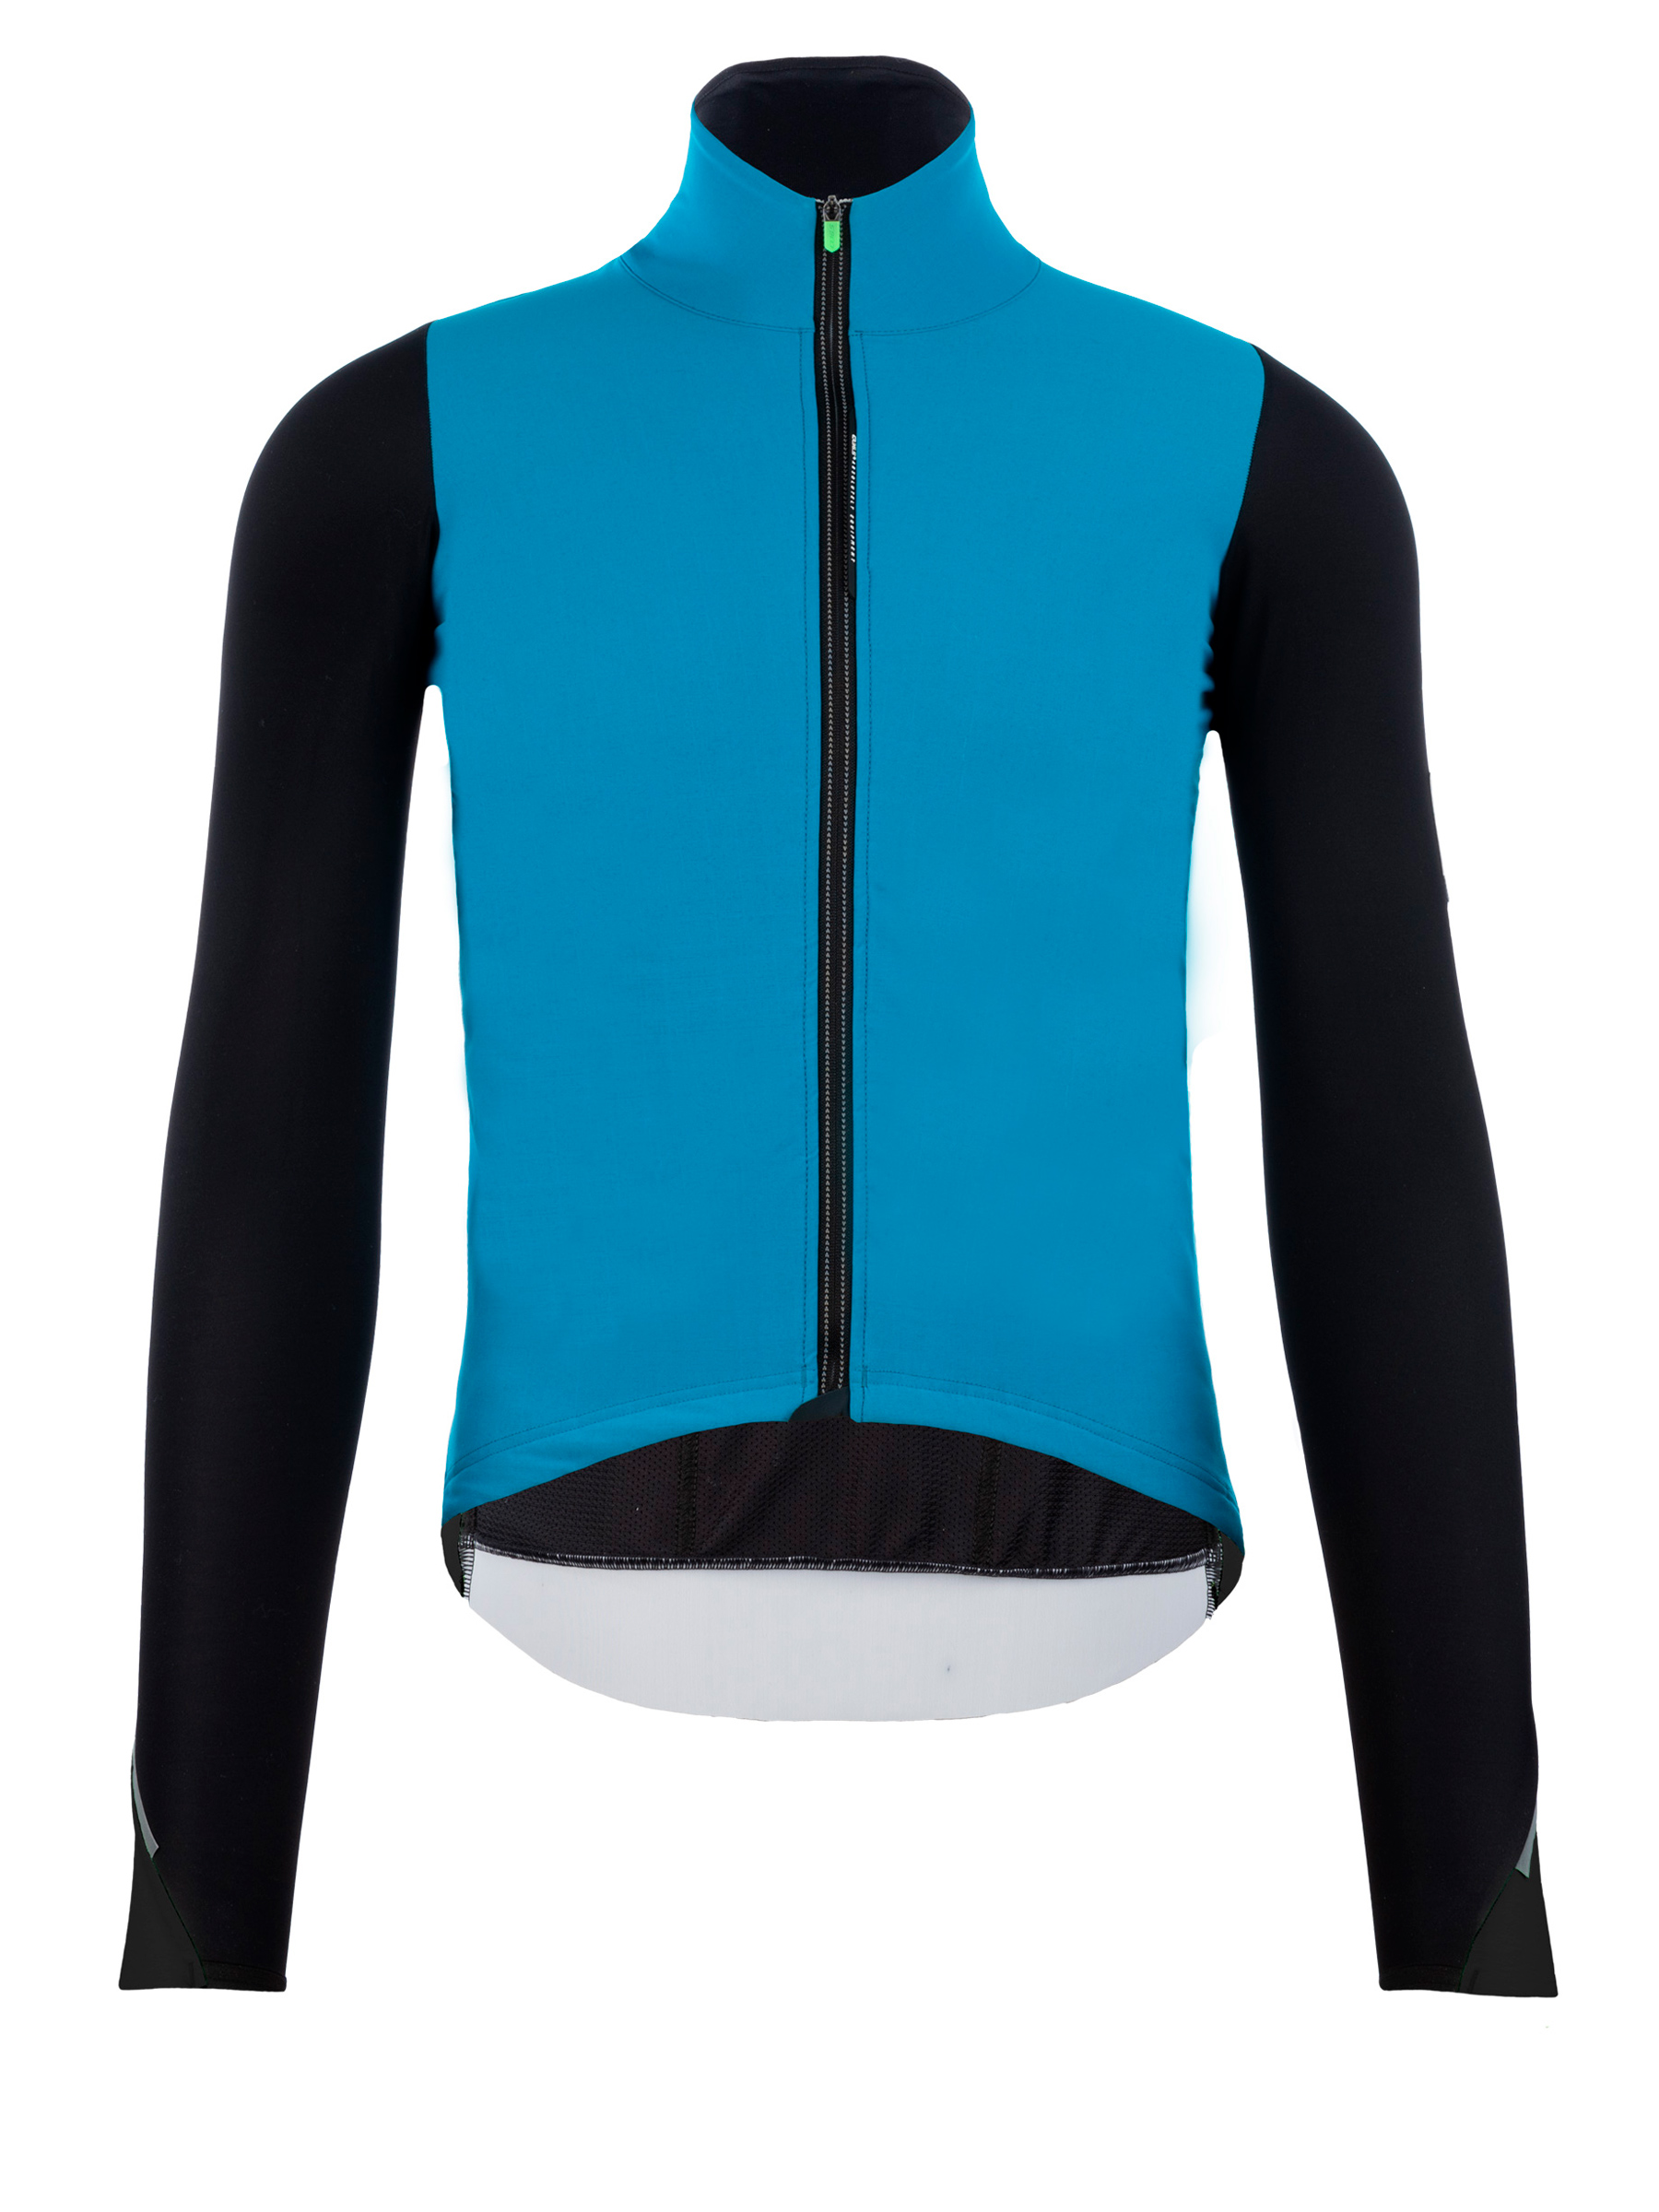 mens cycling jacket Air Insulation black Q36.5